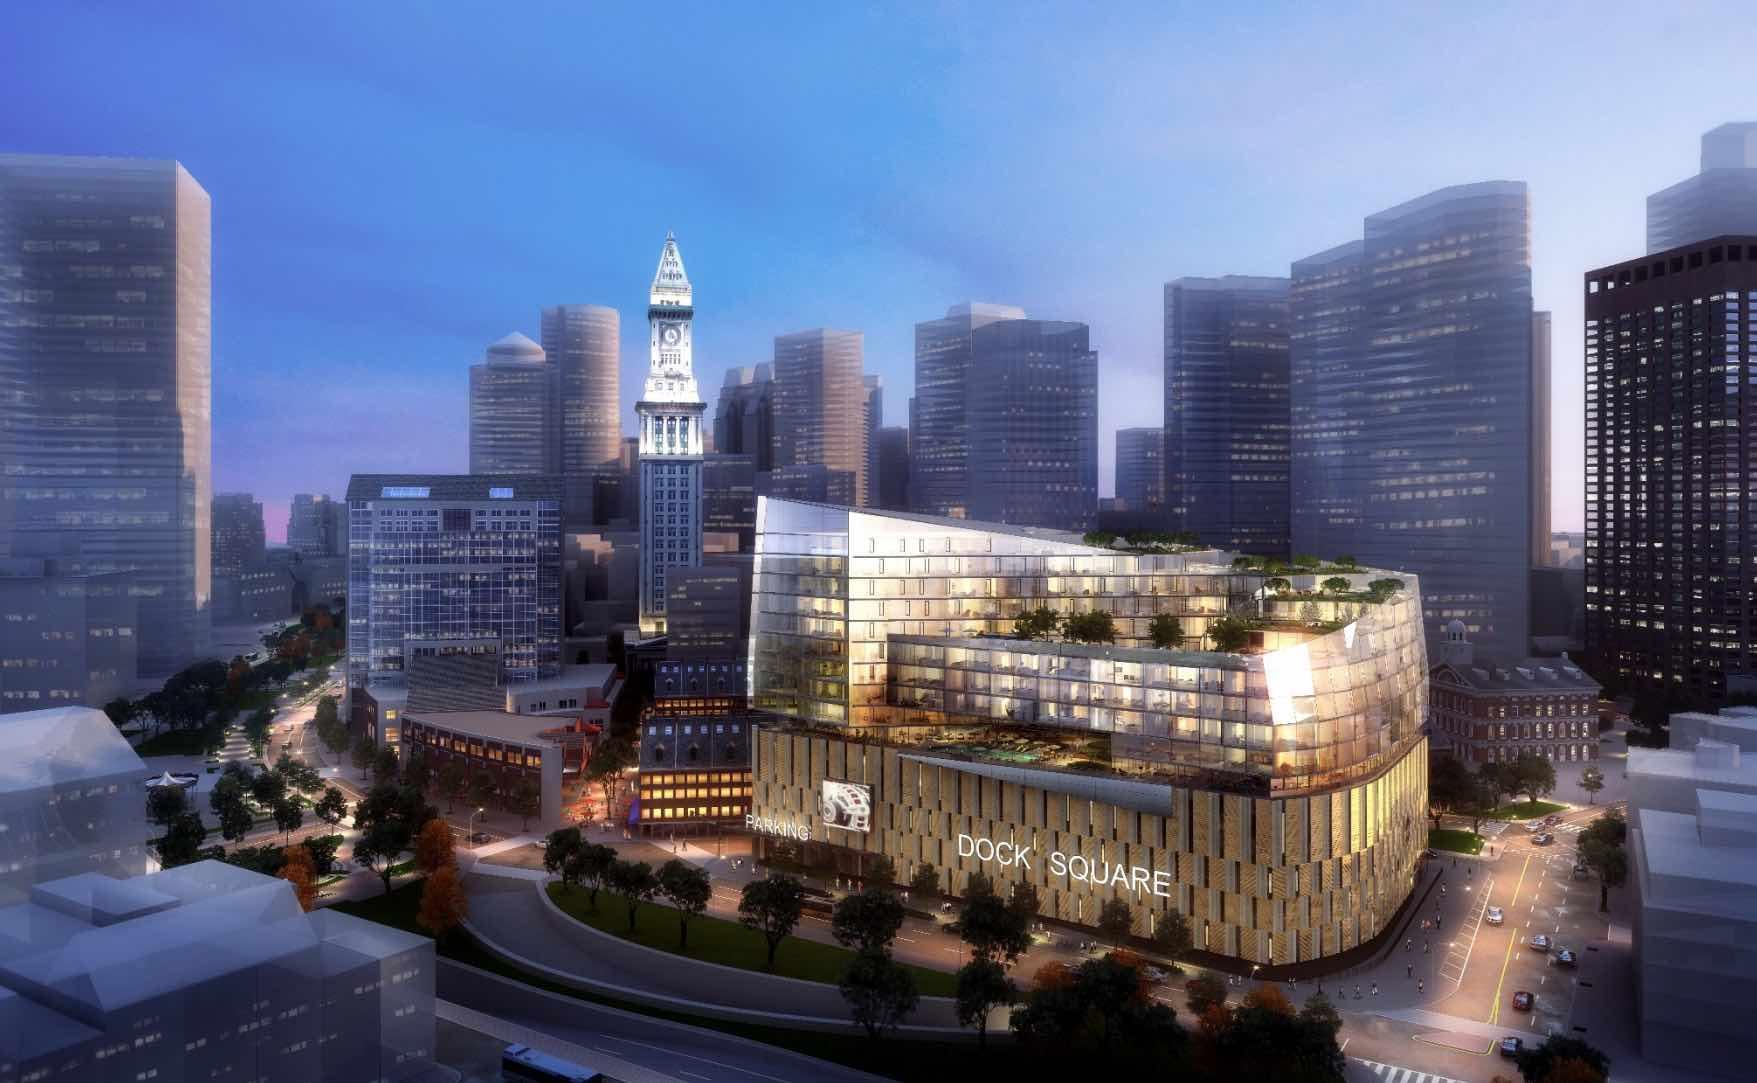 Dock square parking garage real estate development site for sale bulfinch triangle boston